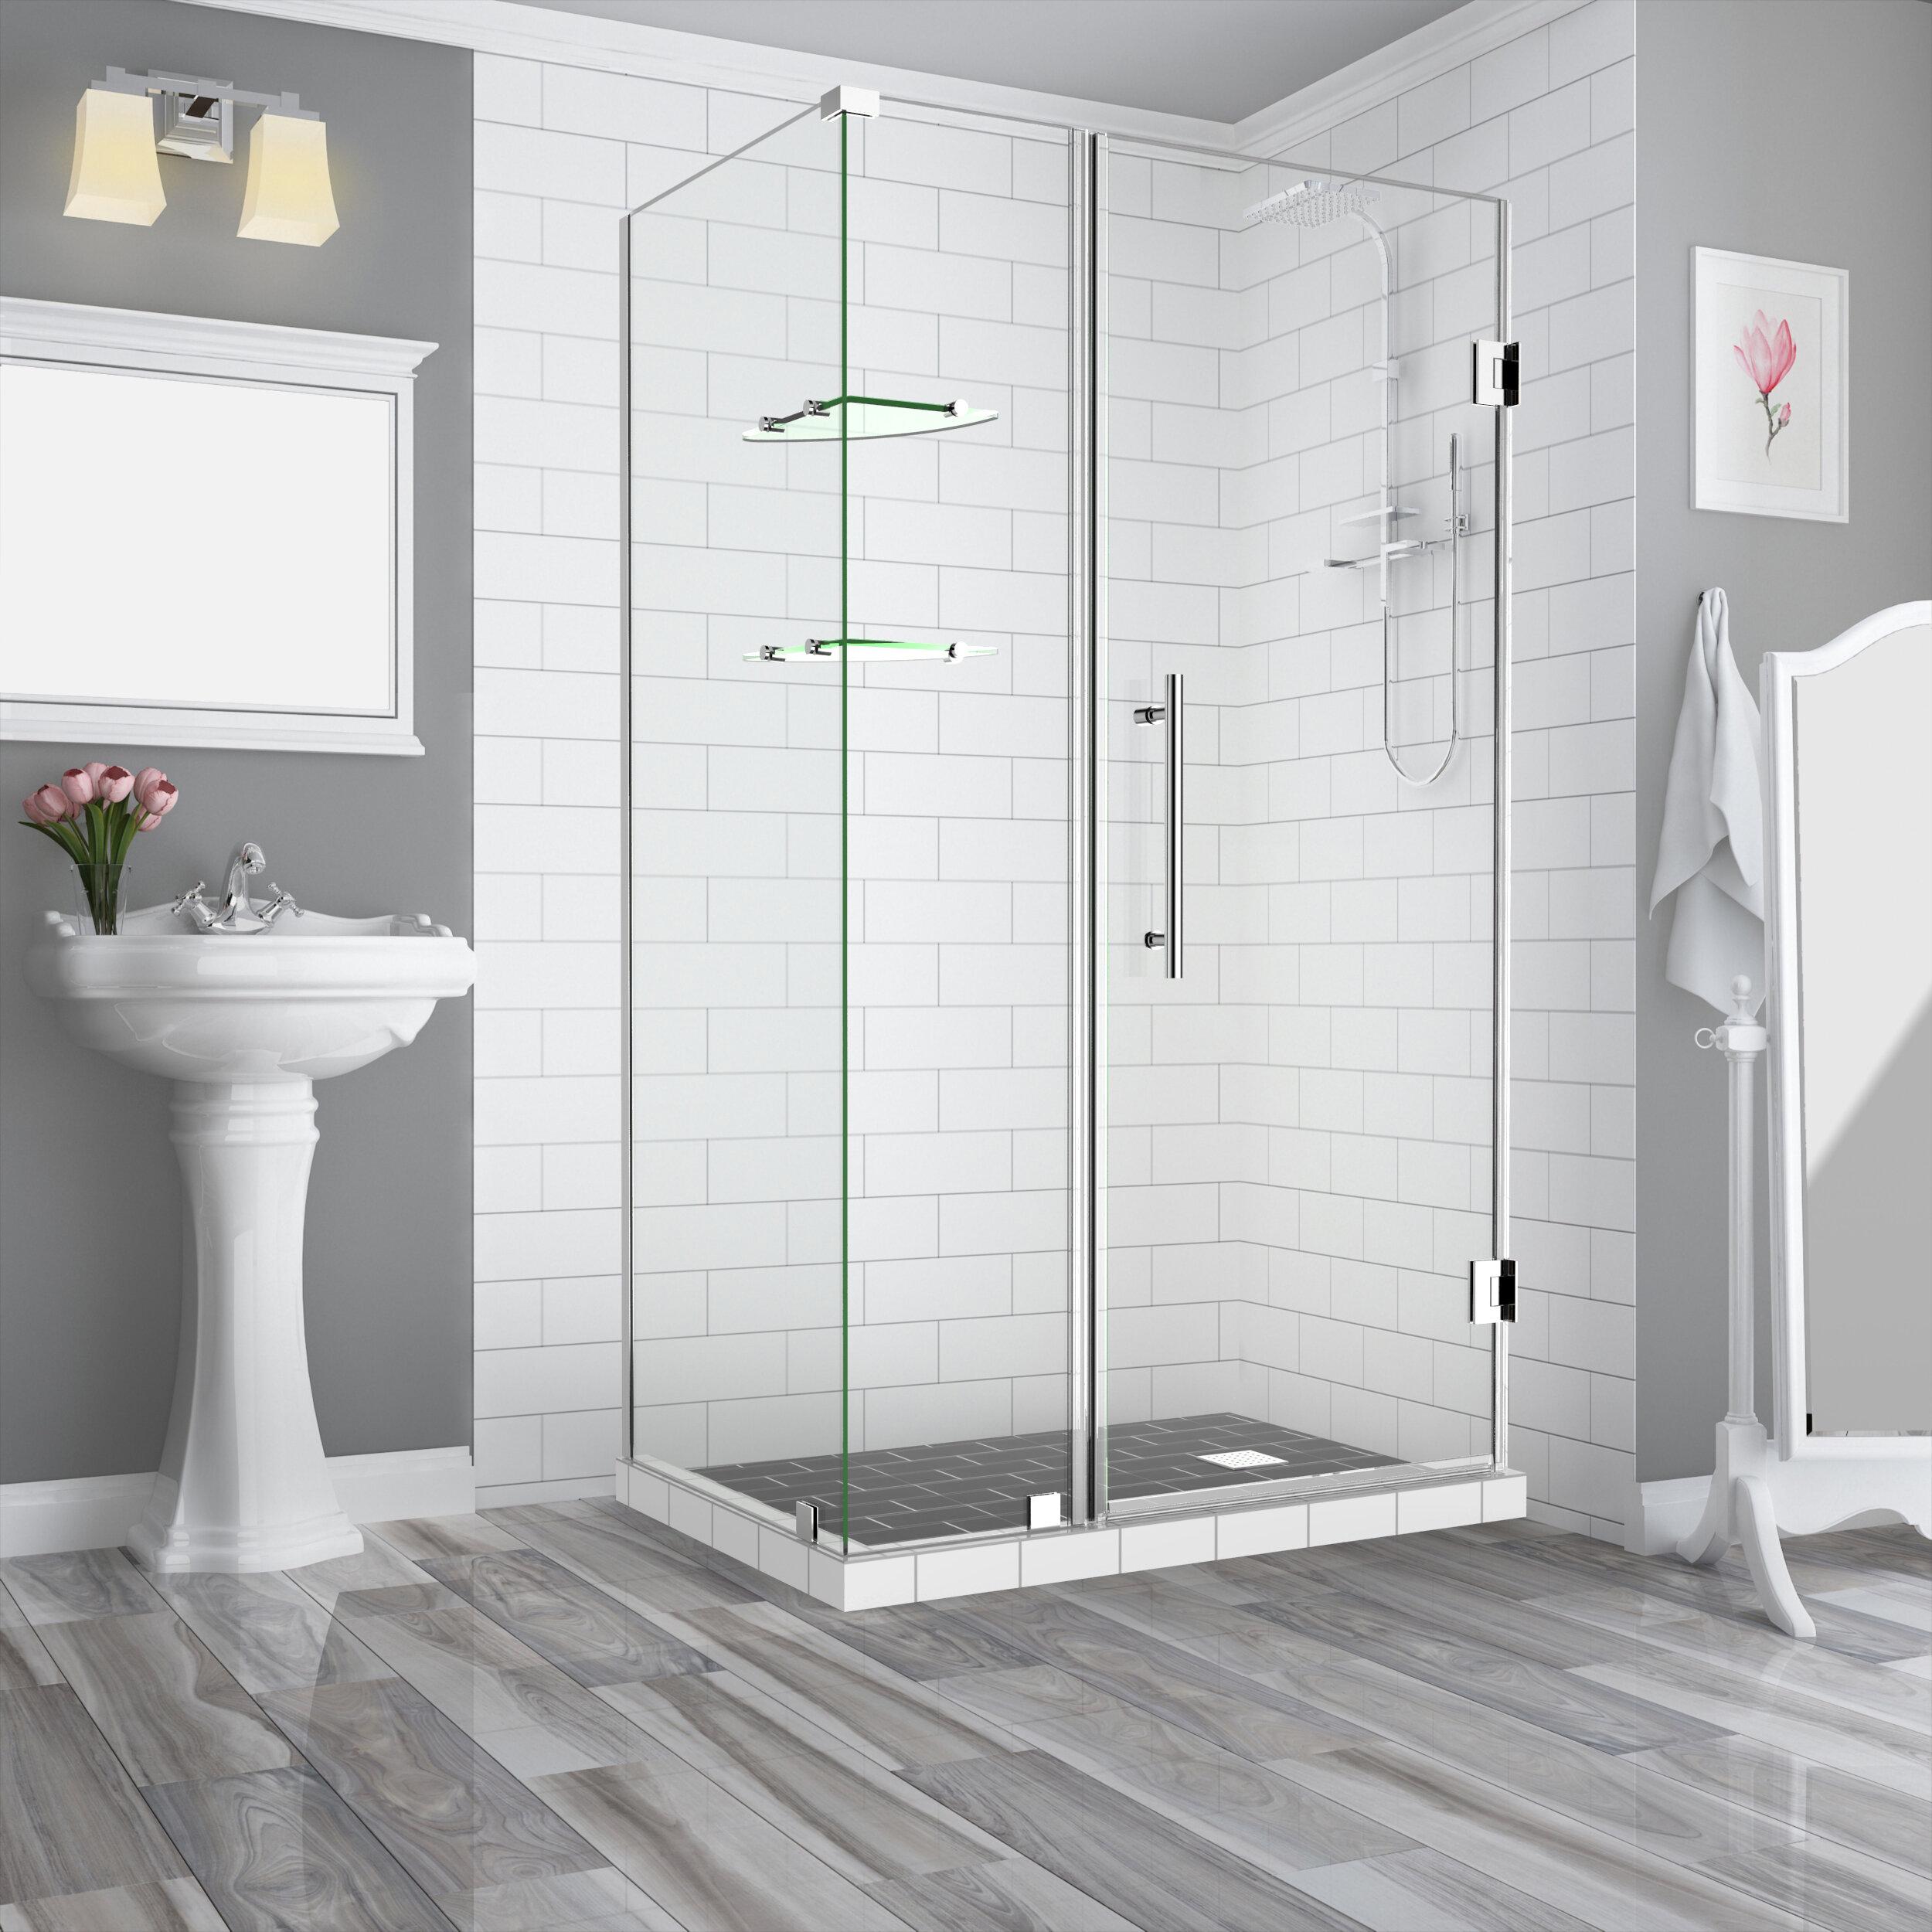 Aston Bromley Gs 55 X 72 Rectangle Hinged Shower Enclosure Wayfair